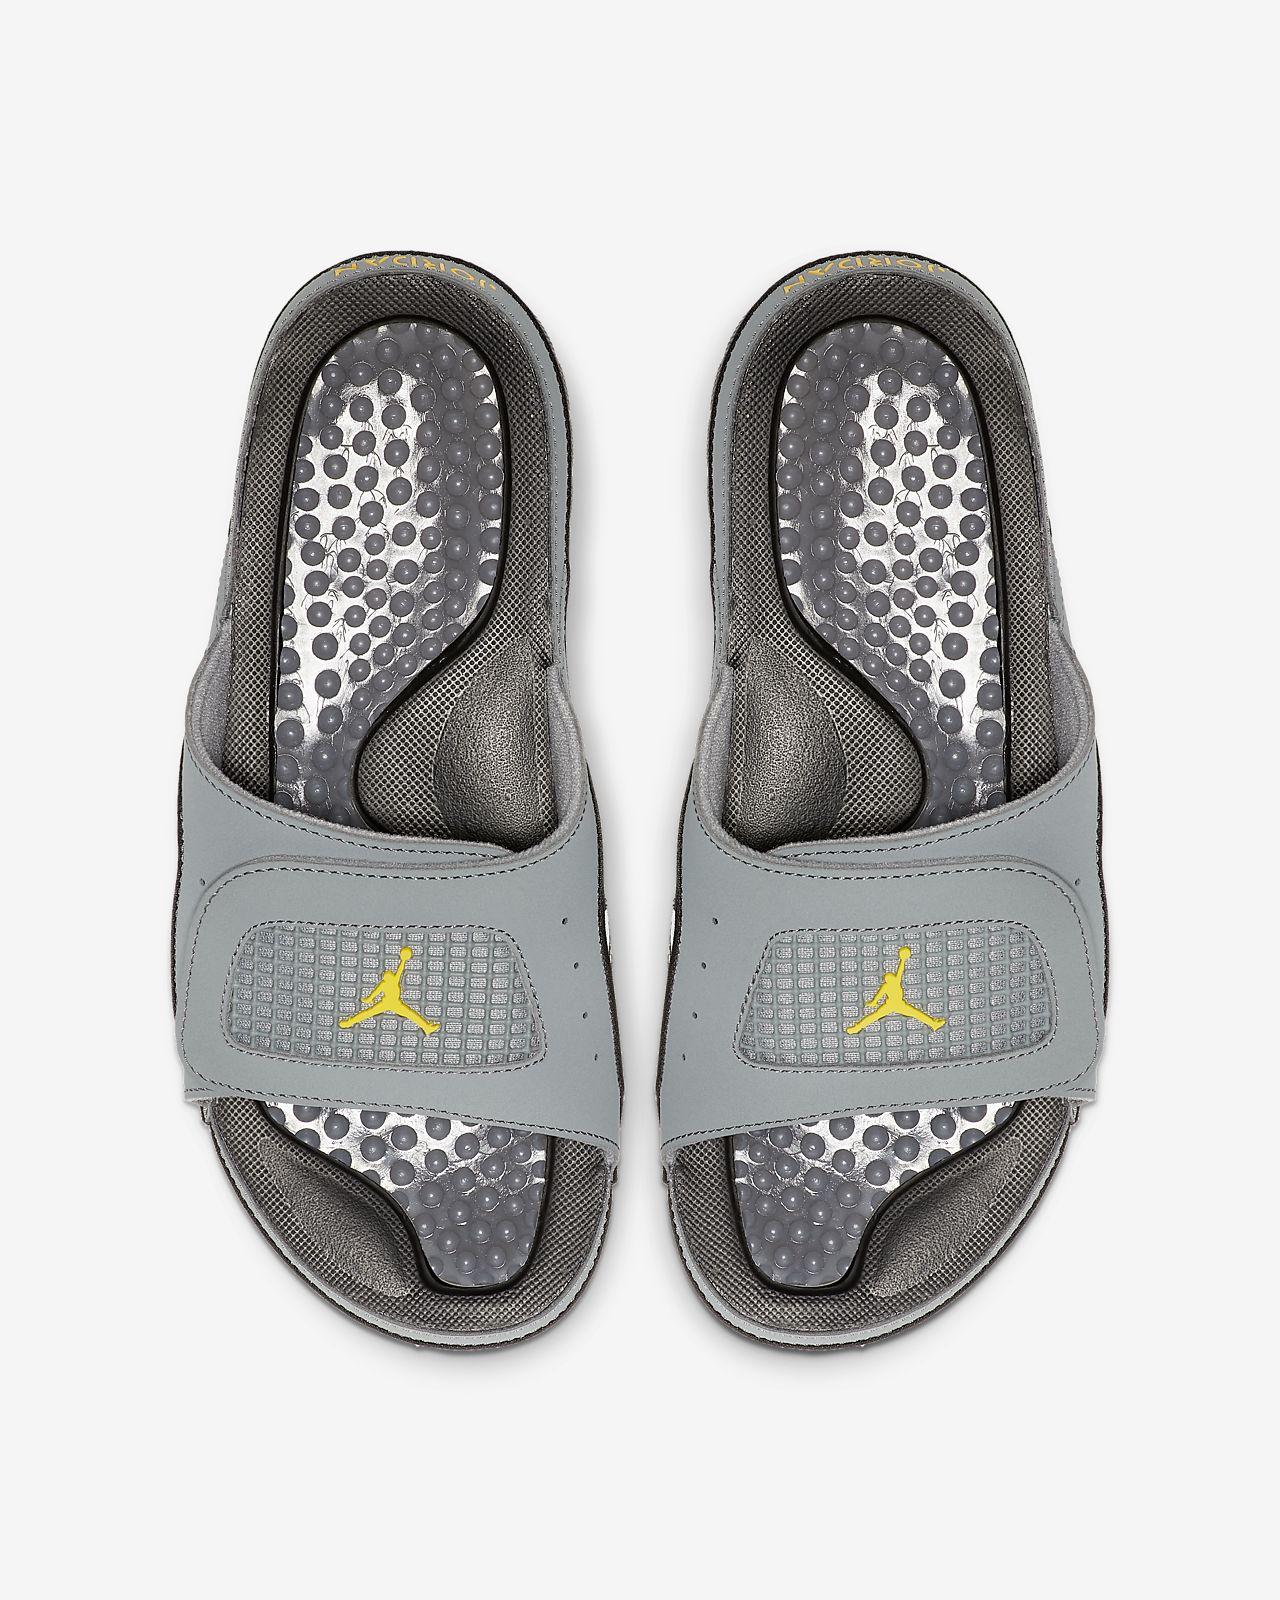 Jordan Hydro IV Retro 复刻男子拖鞋